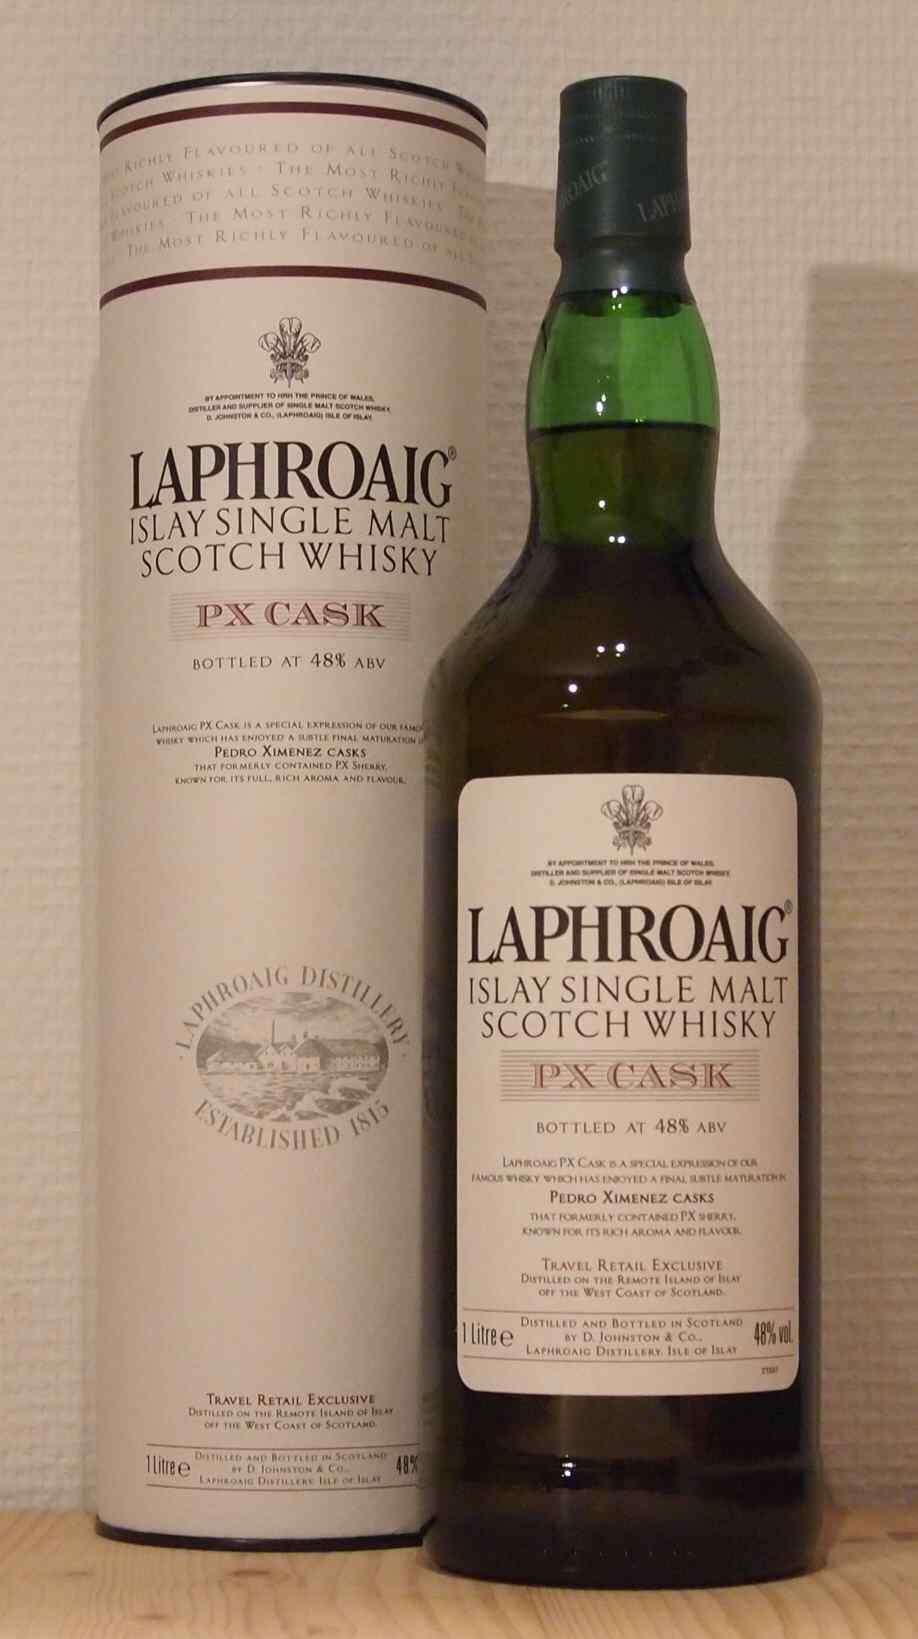 Single Malt Whisky Laphroaig PX Cask, ca. 2012